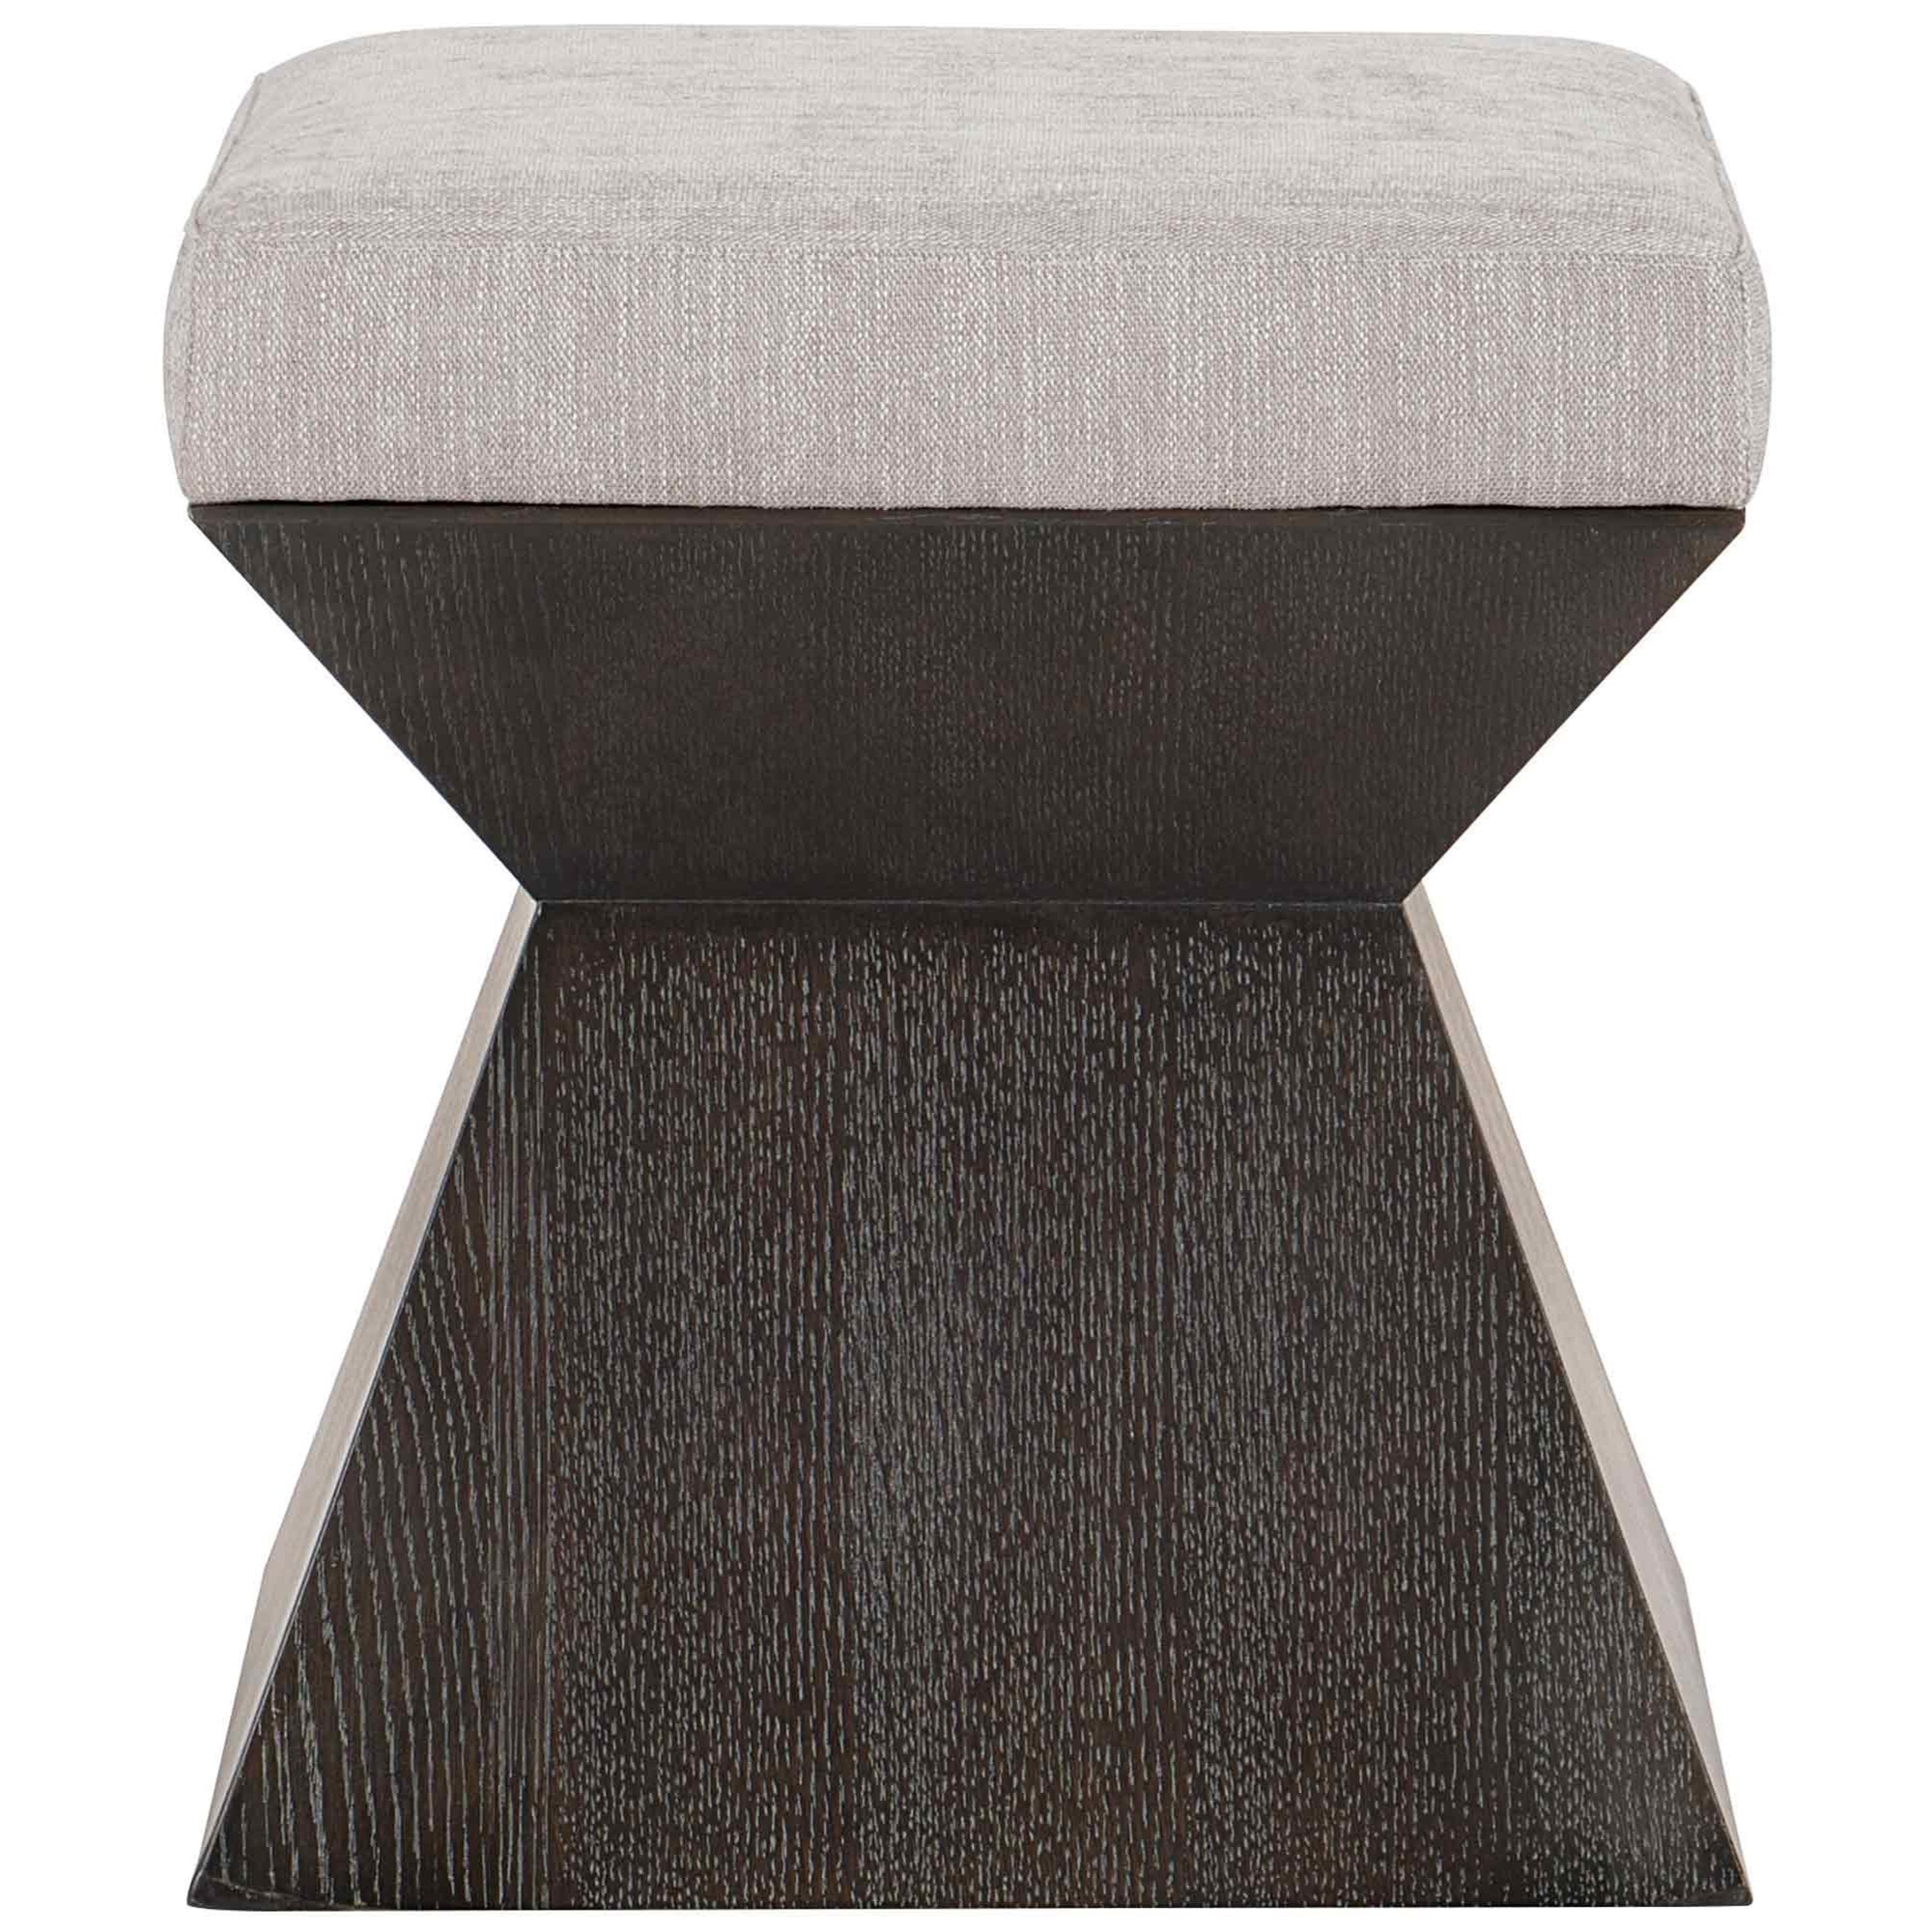 Decorage Customizable Bench by Bernhardt at Baer's Furniture